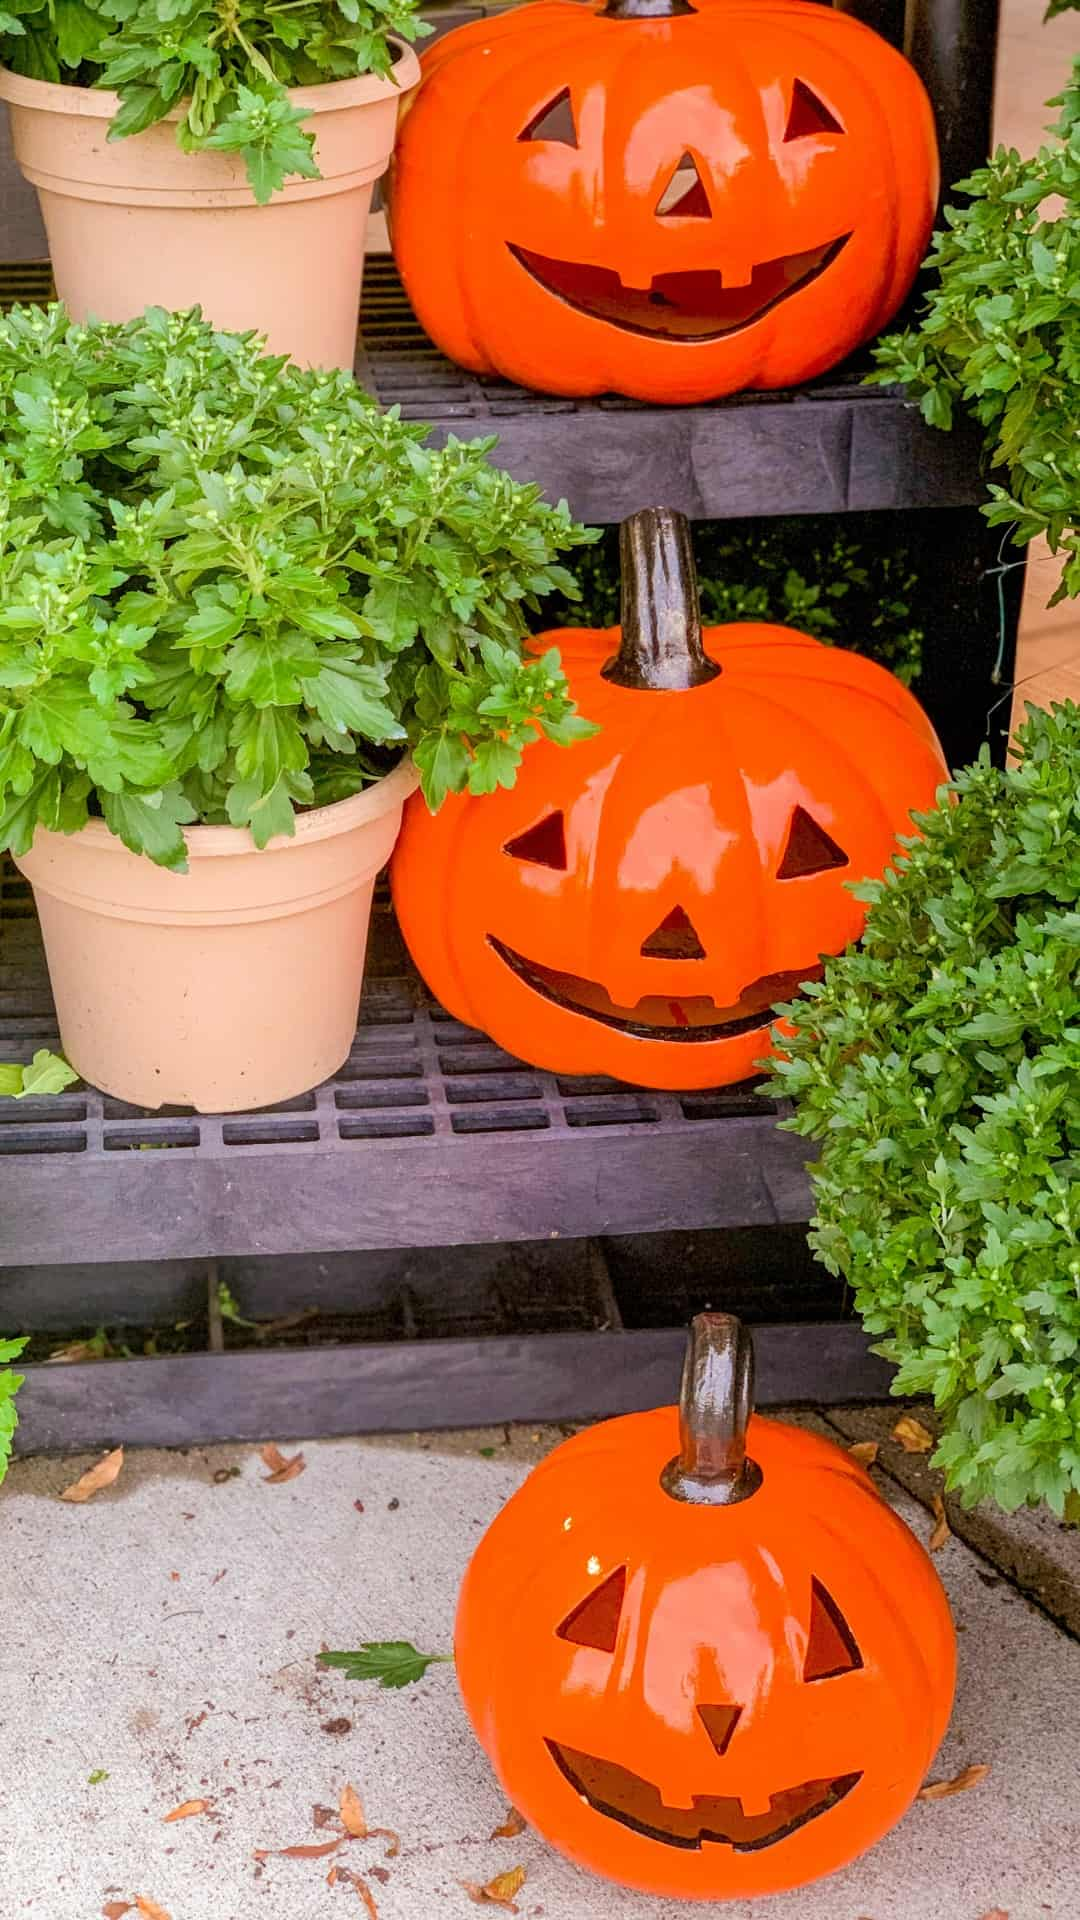 Autumn Wallpaper iPhone Aesthetic Pumpkin Jack-o-lanterns